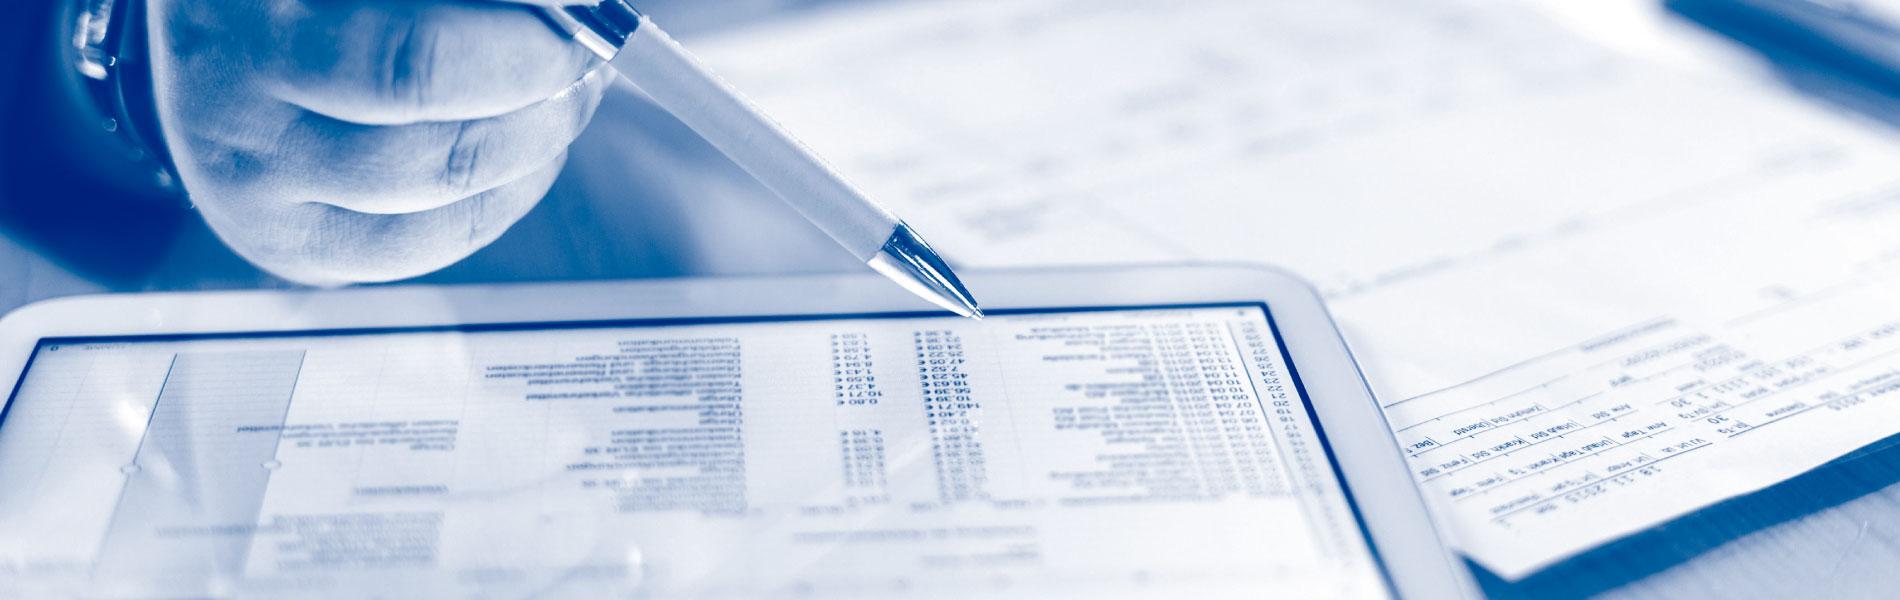 Bookkeeping_fundamentals_1900x600.jpg